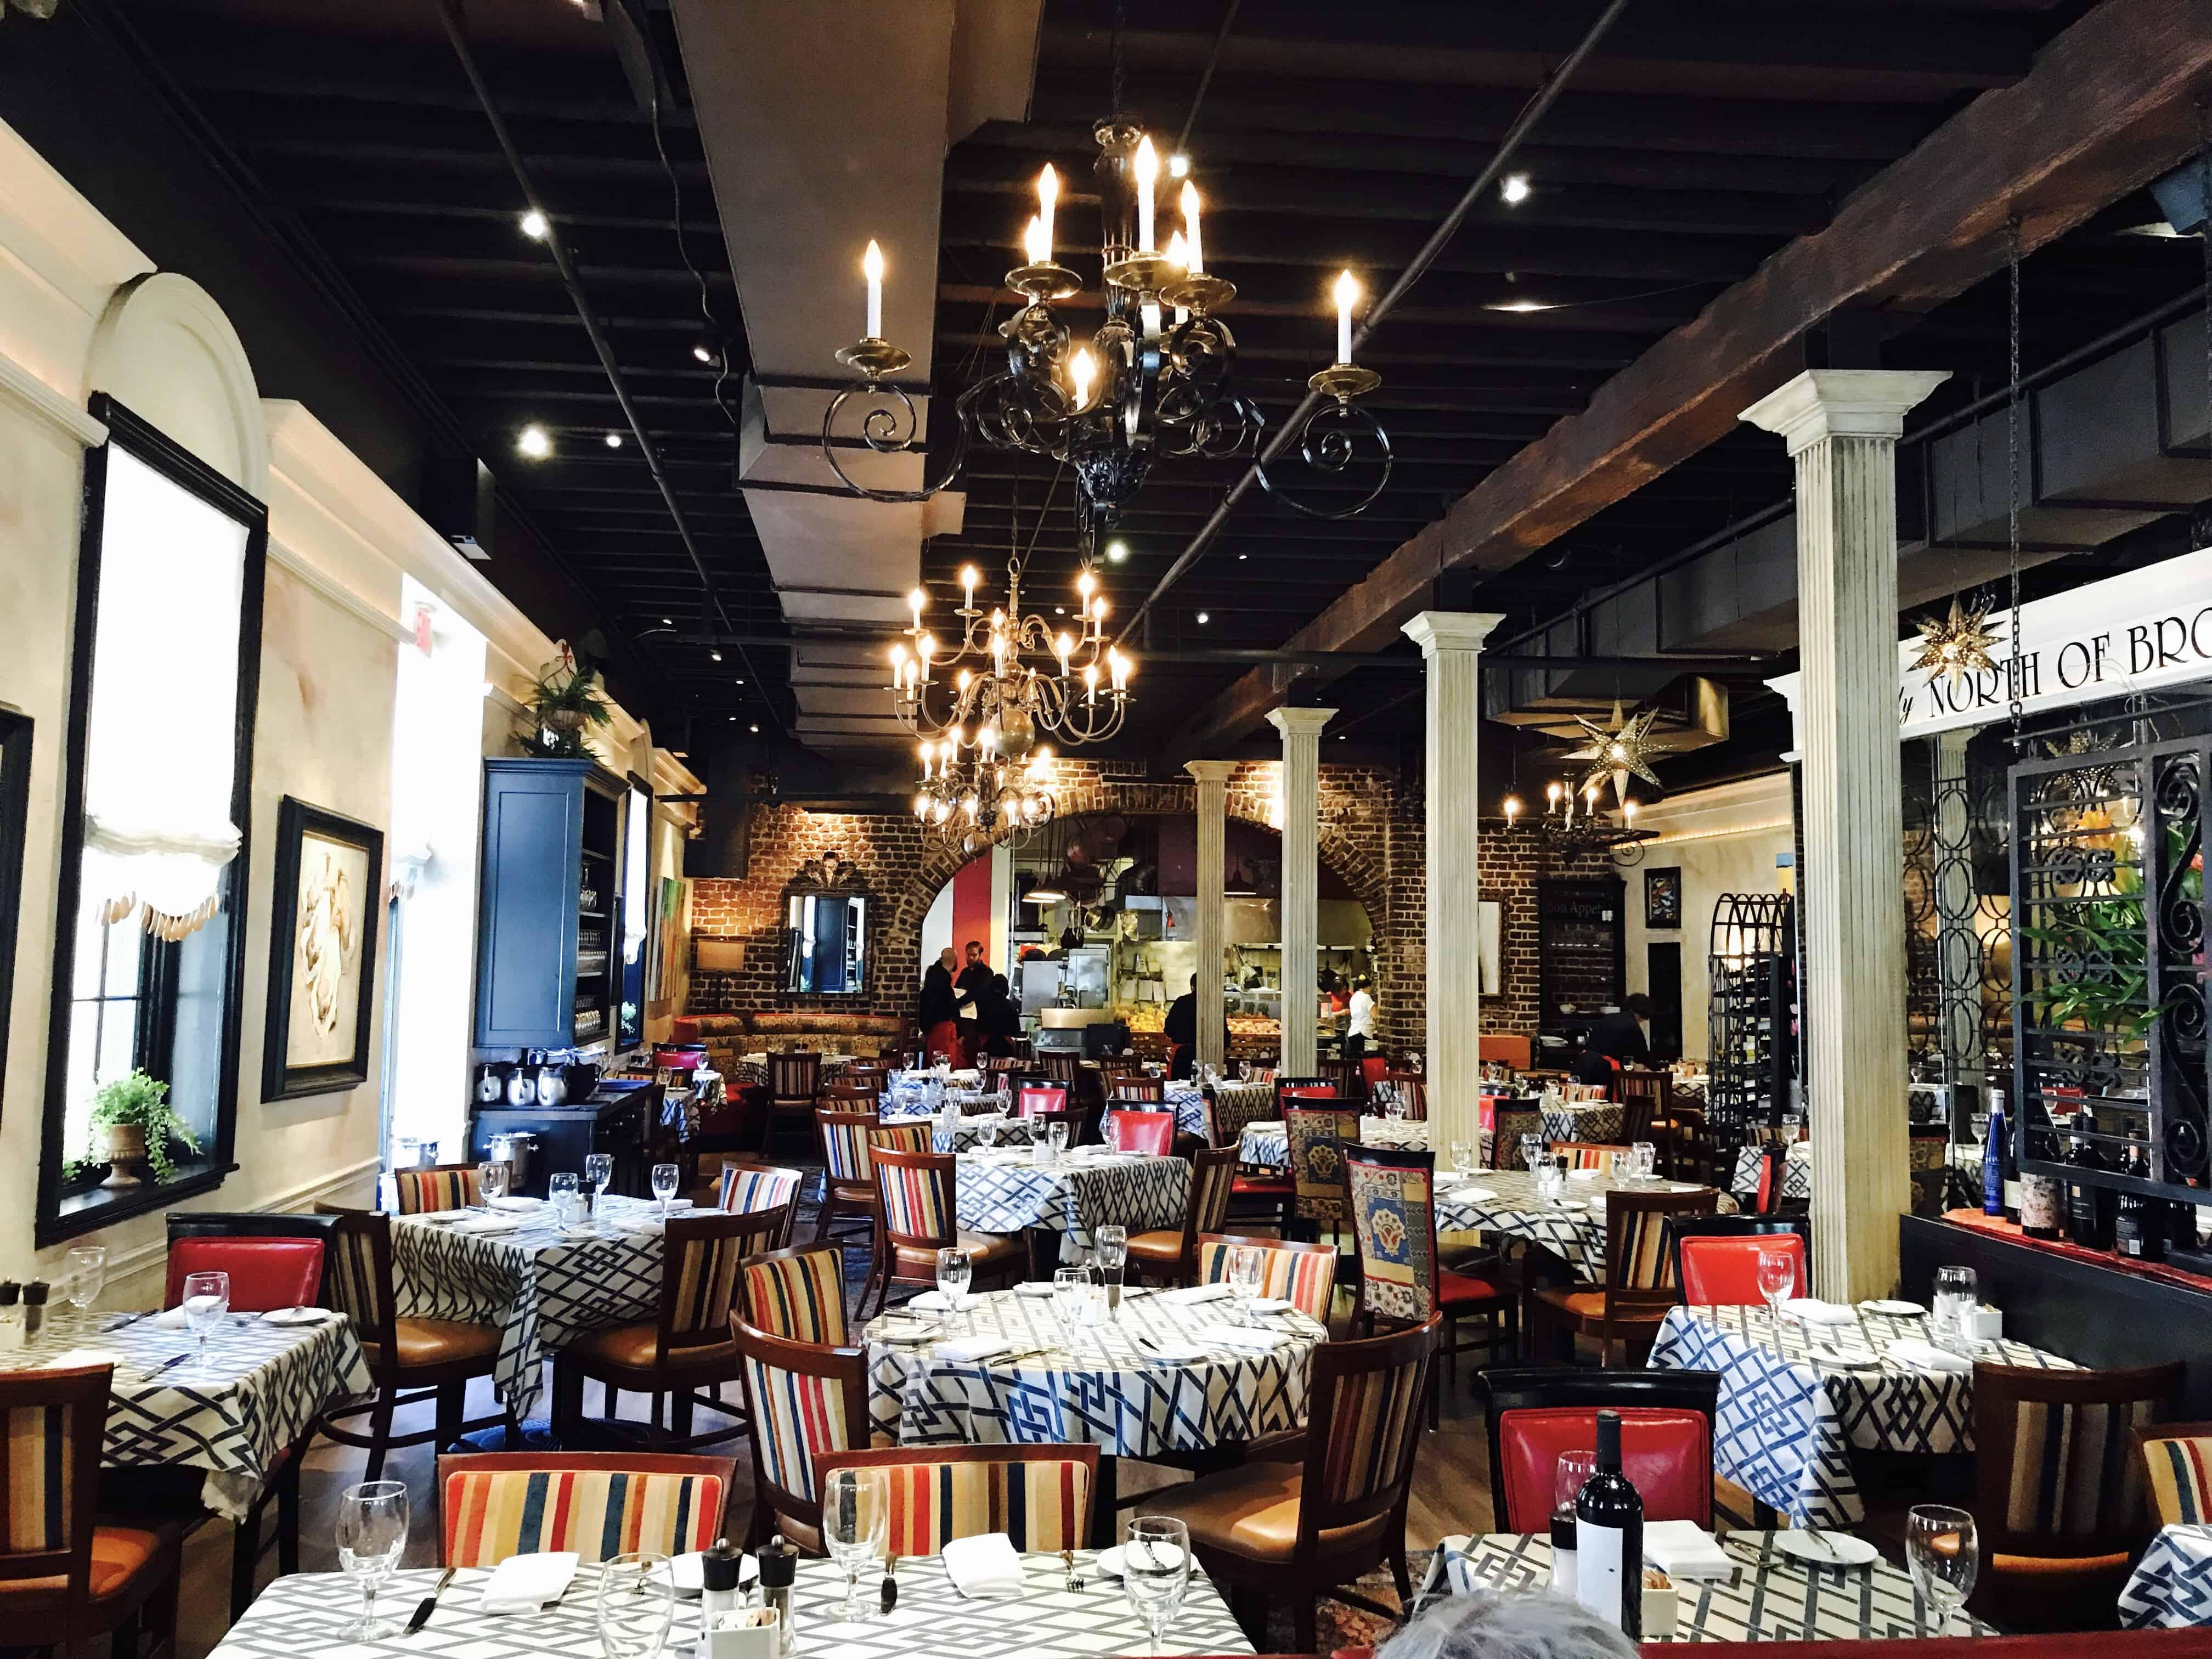 S.N.O.B. Charleston dining room